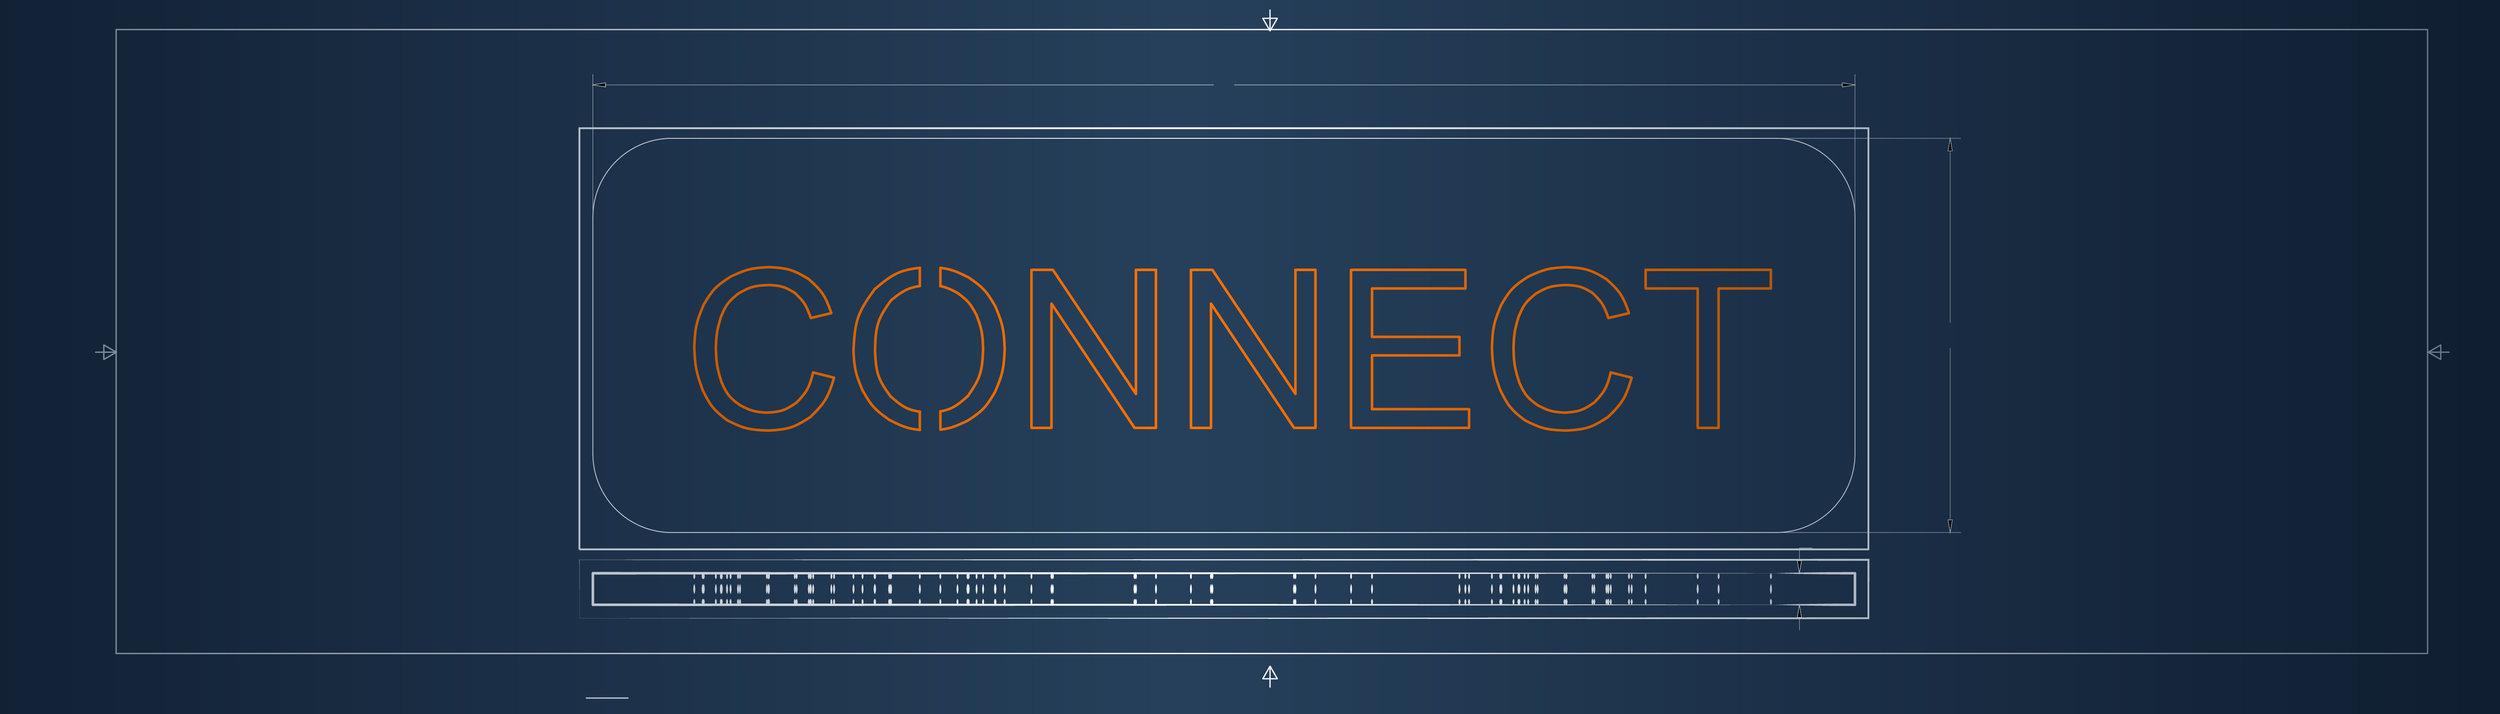 connectvrs 1-01.jpg